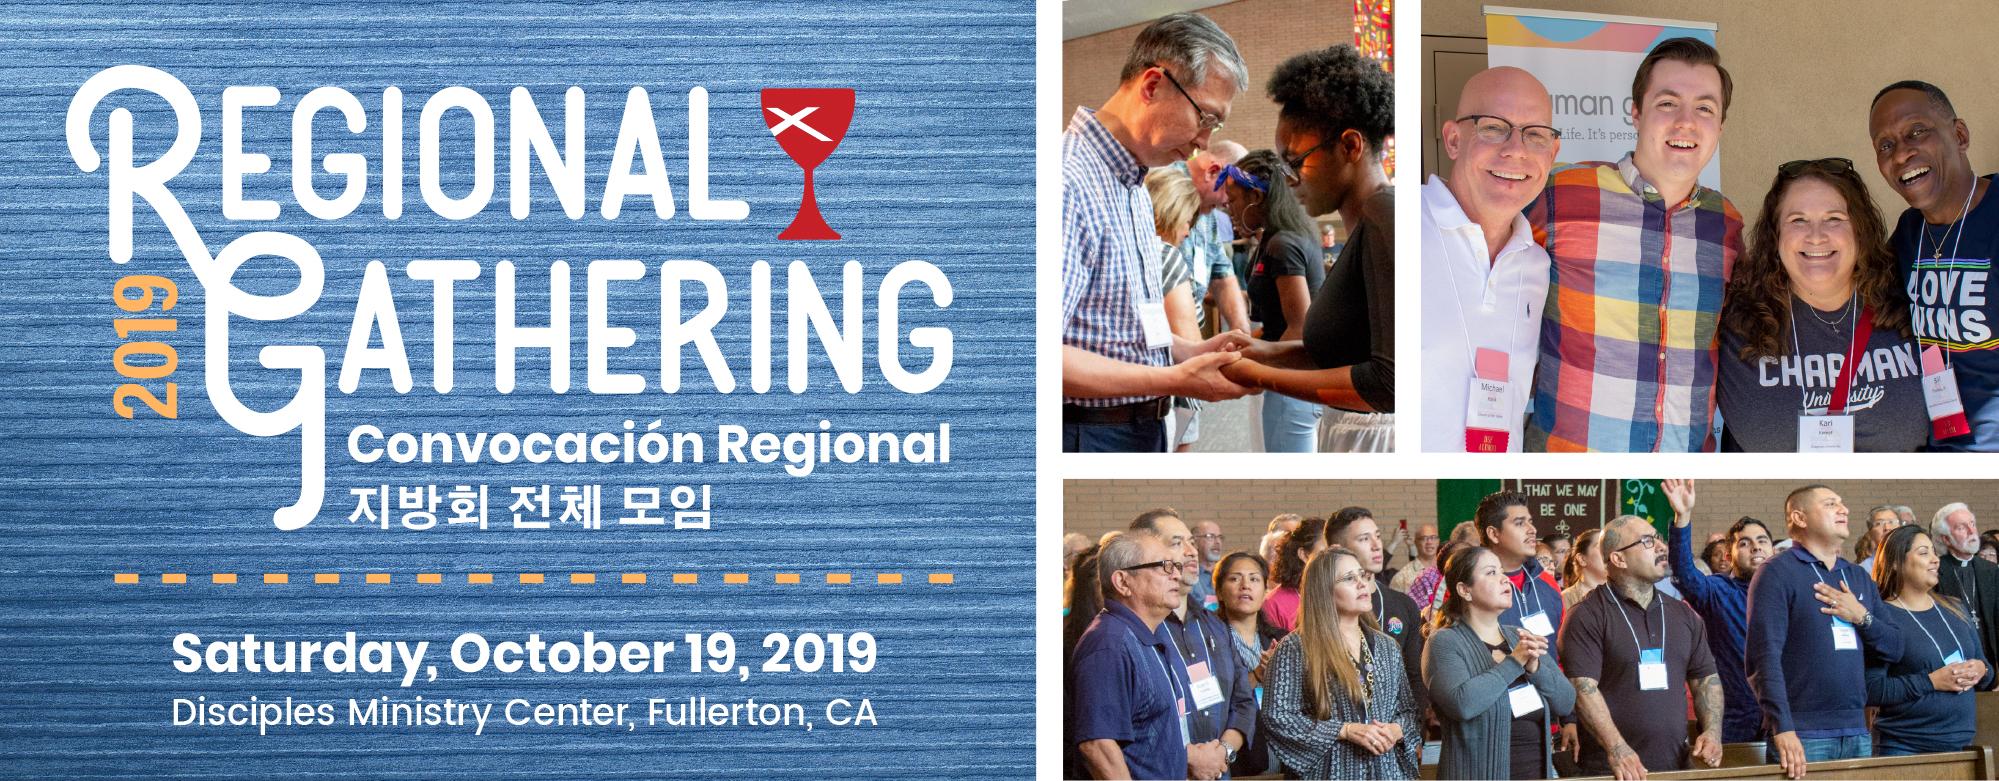 regional gathering banner-2.jpg